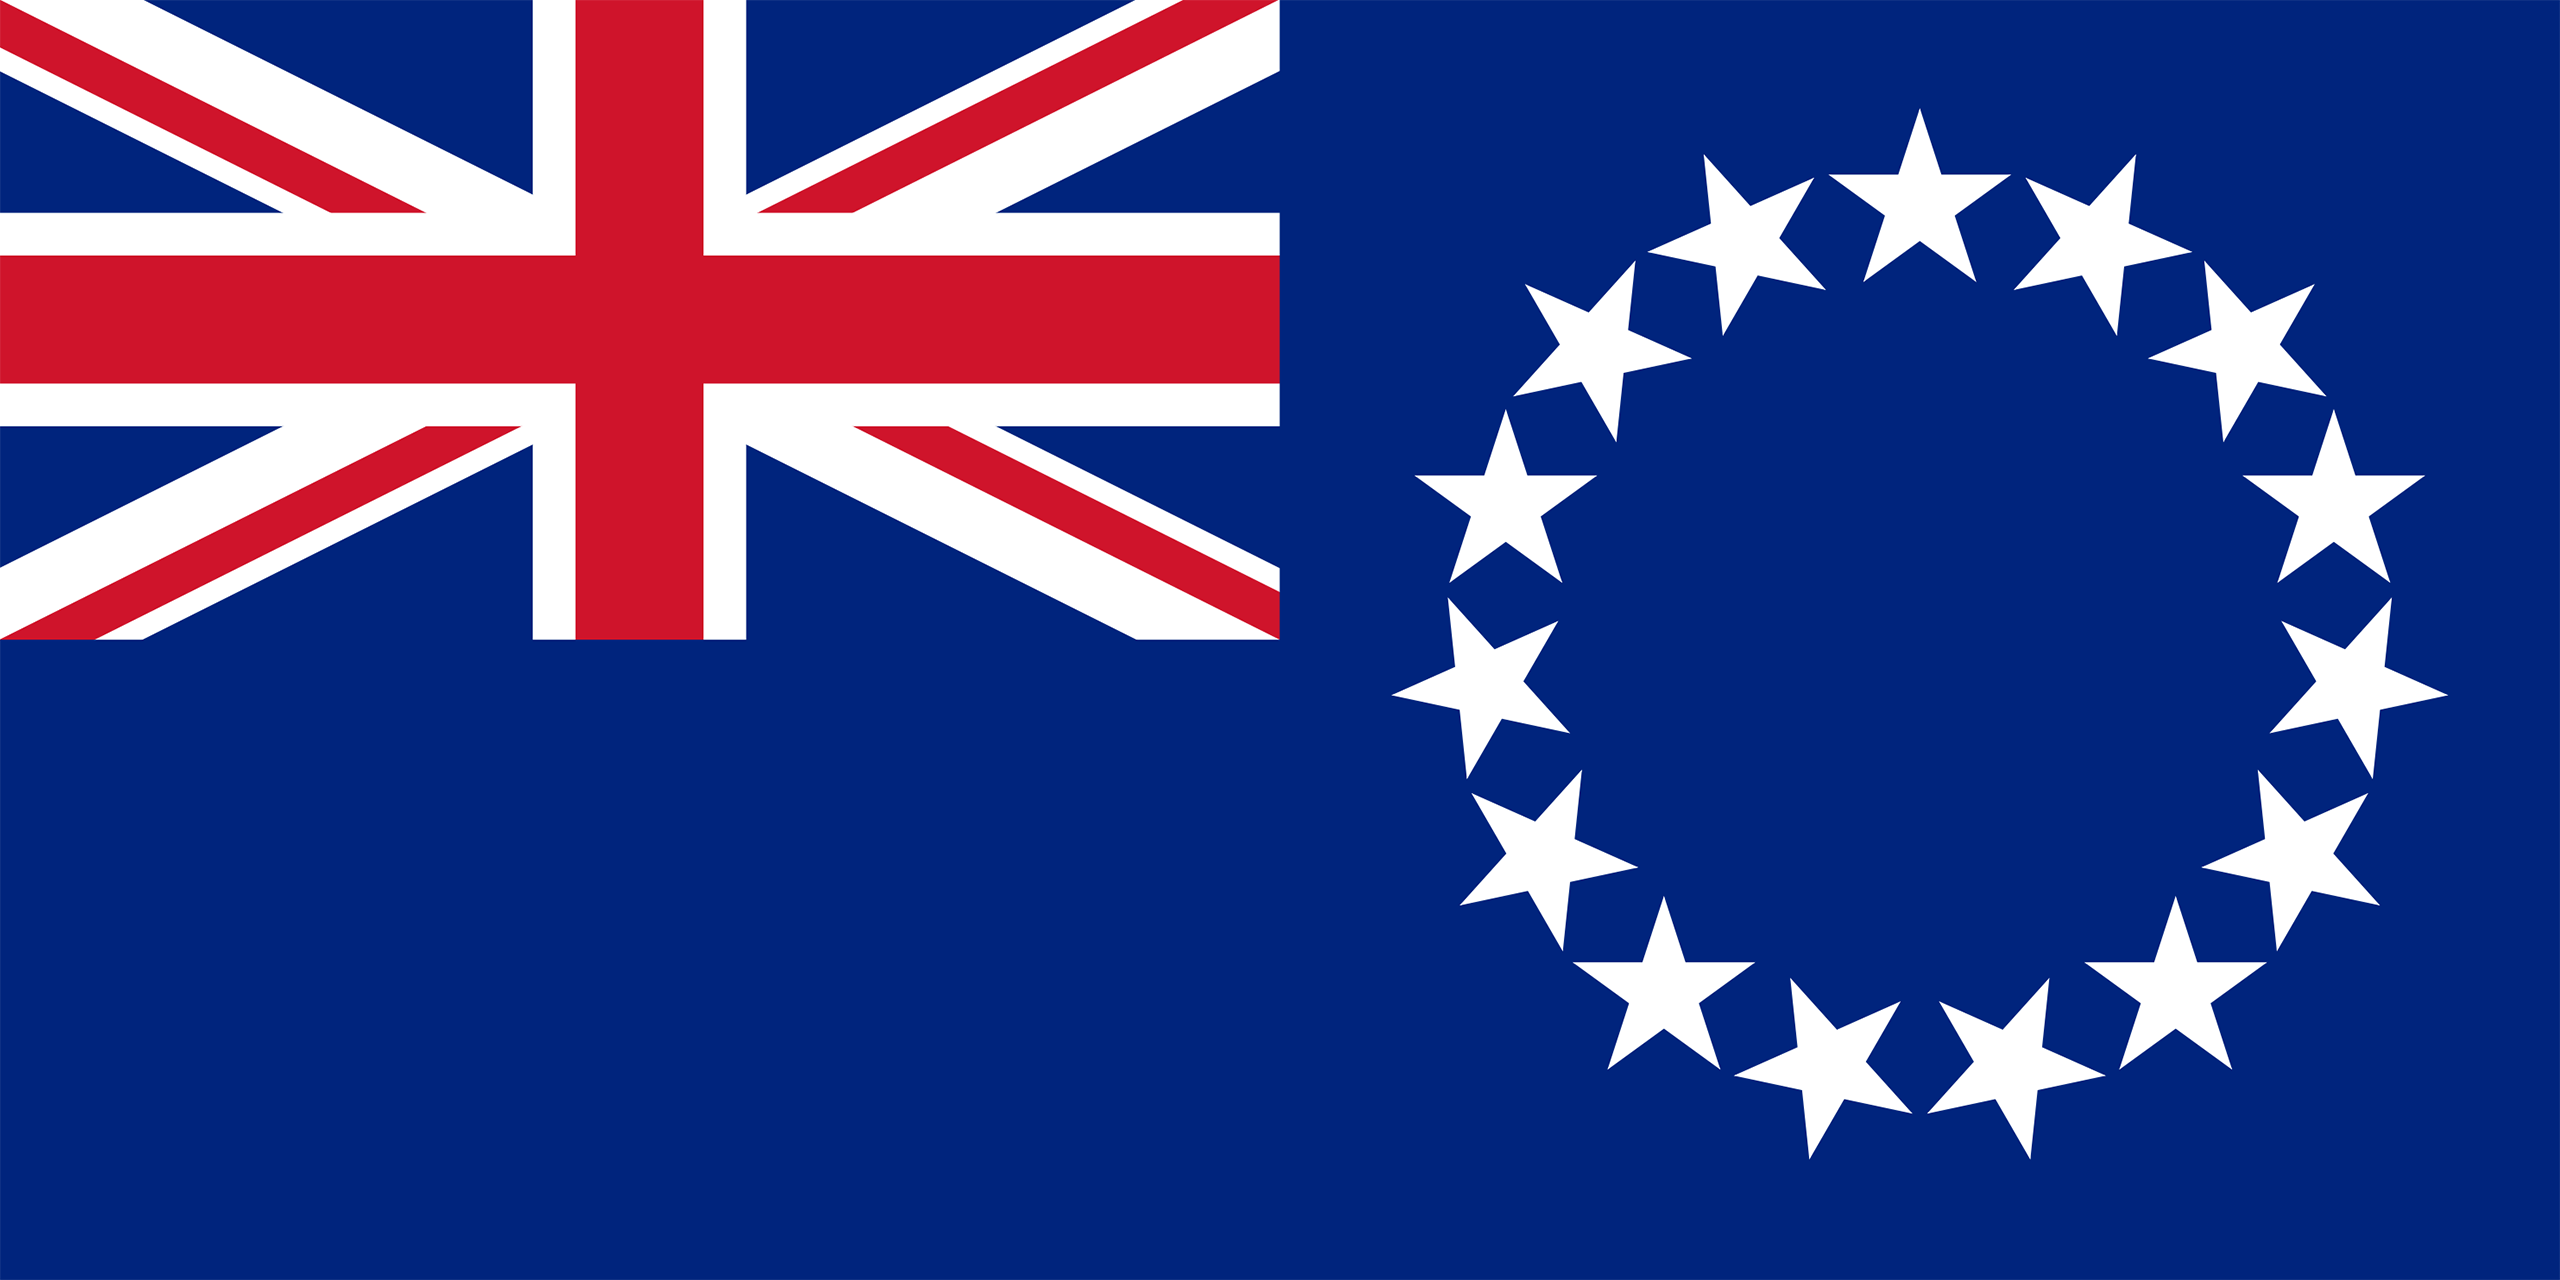 islas cook, paese, emblema, logo, simbolo - Sfondi HD - Professor-falken.com